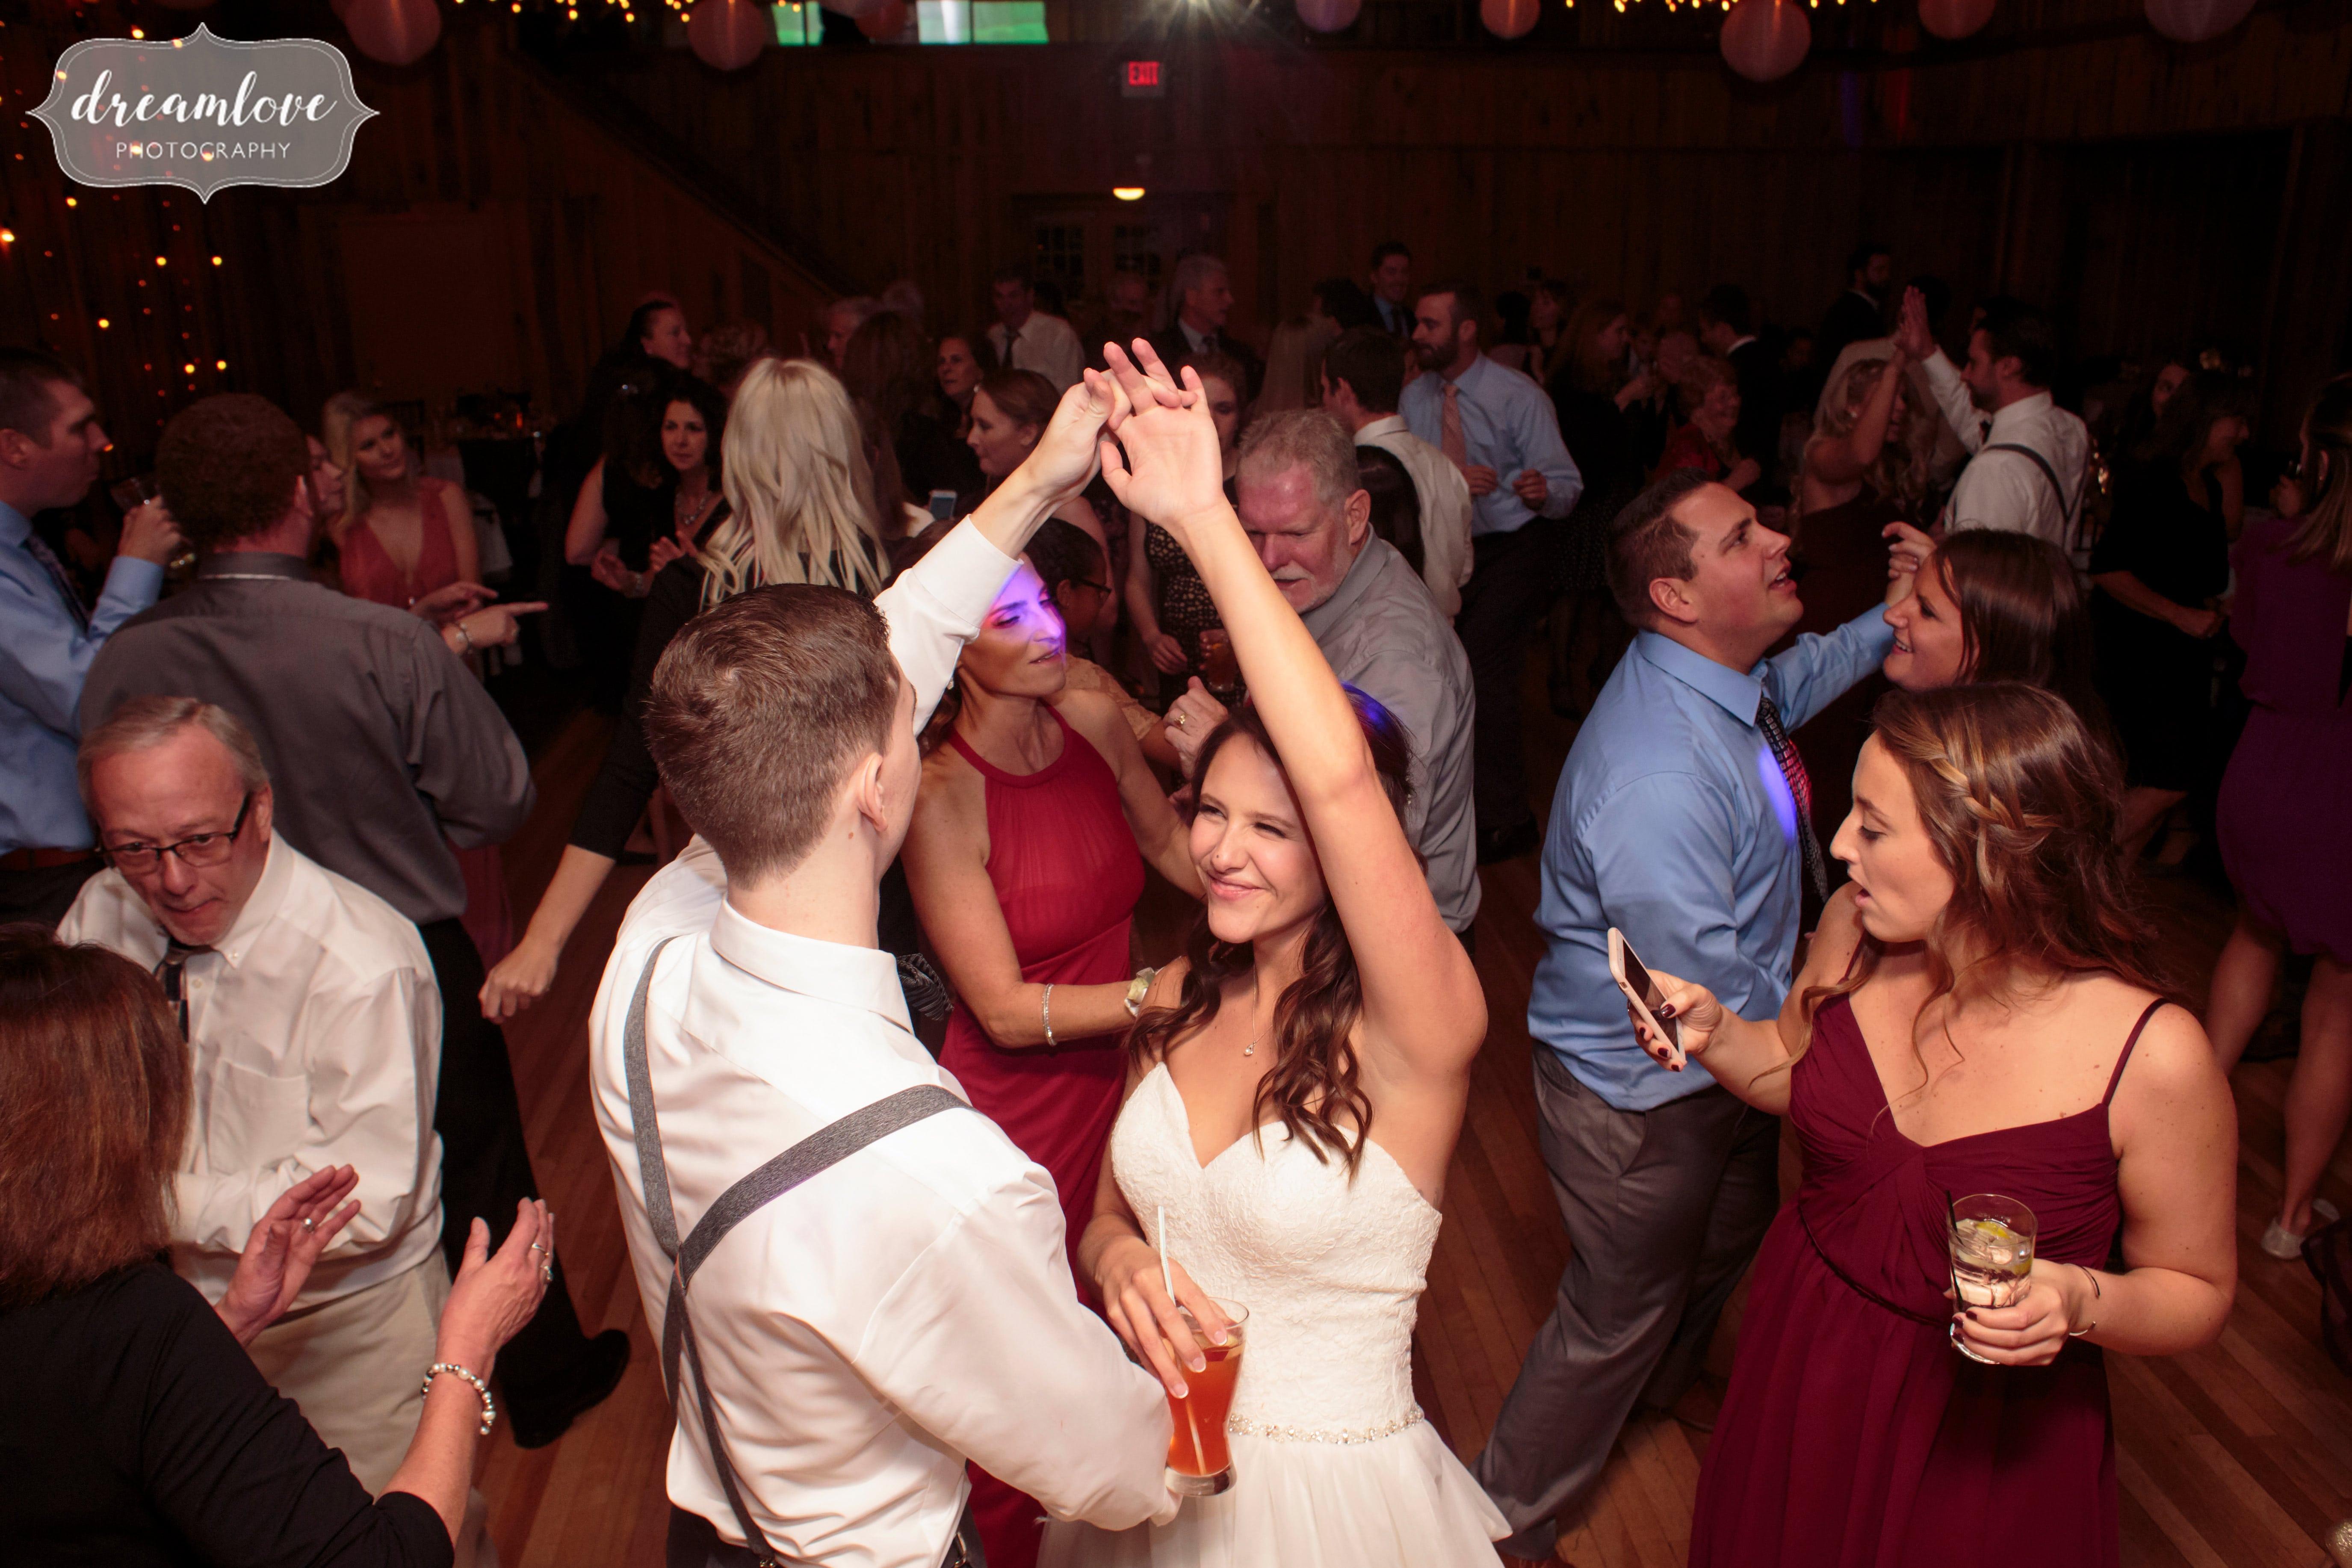 Fun wedding photography on dance floor at Crystal Lake Pavilion.